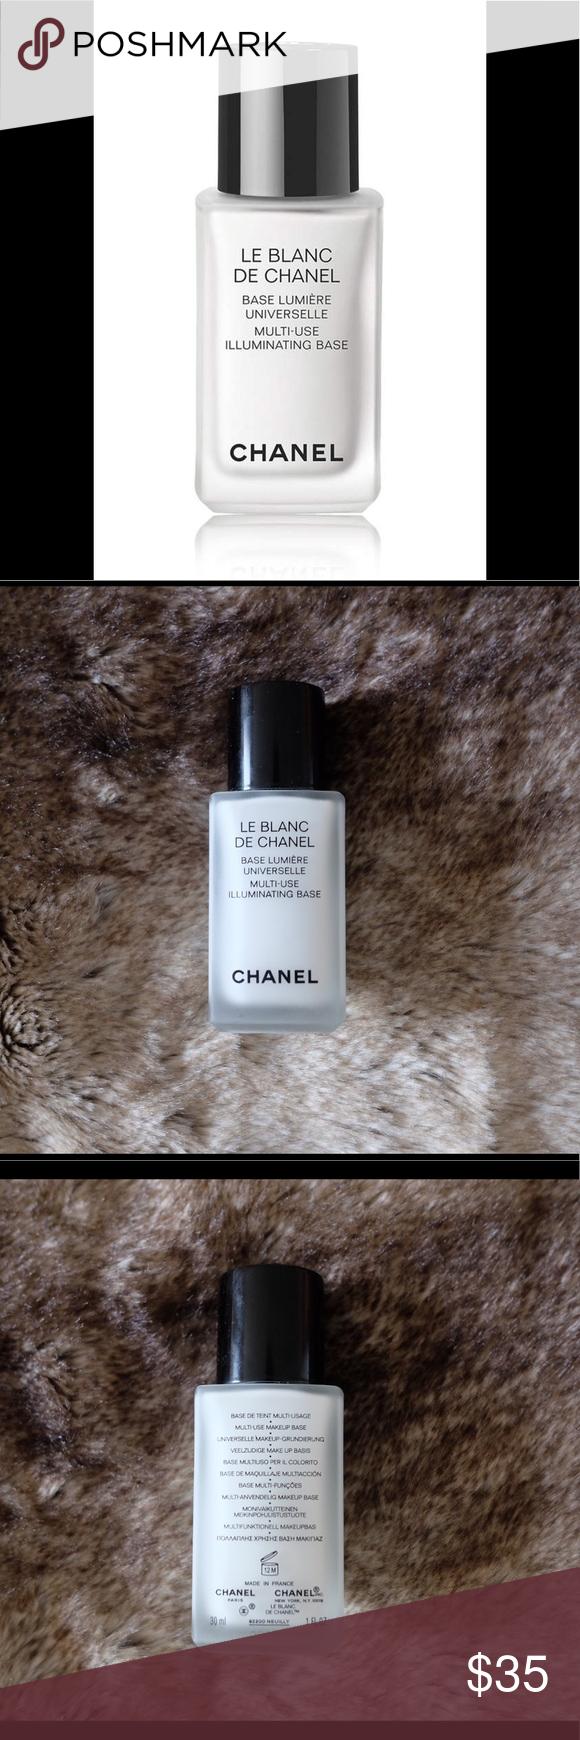 Chanel Le Blanc MultiUse Illuminating Base Primer A